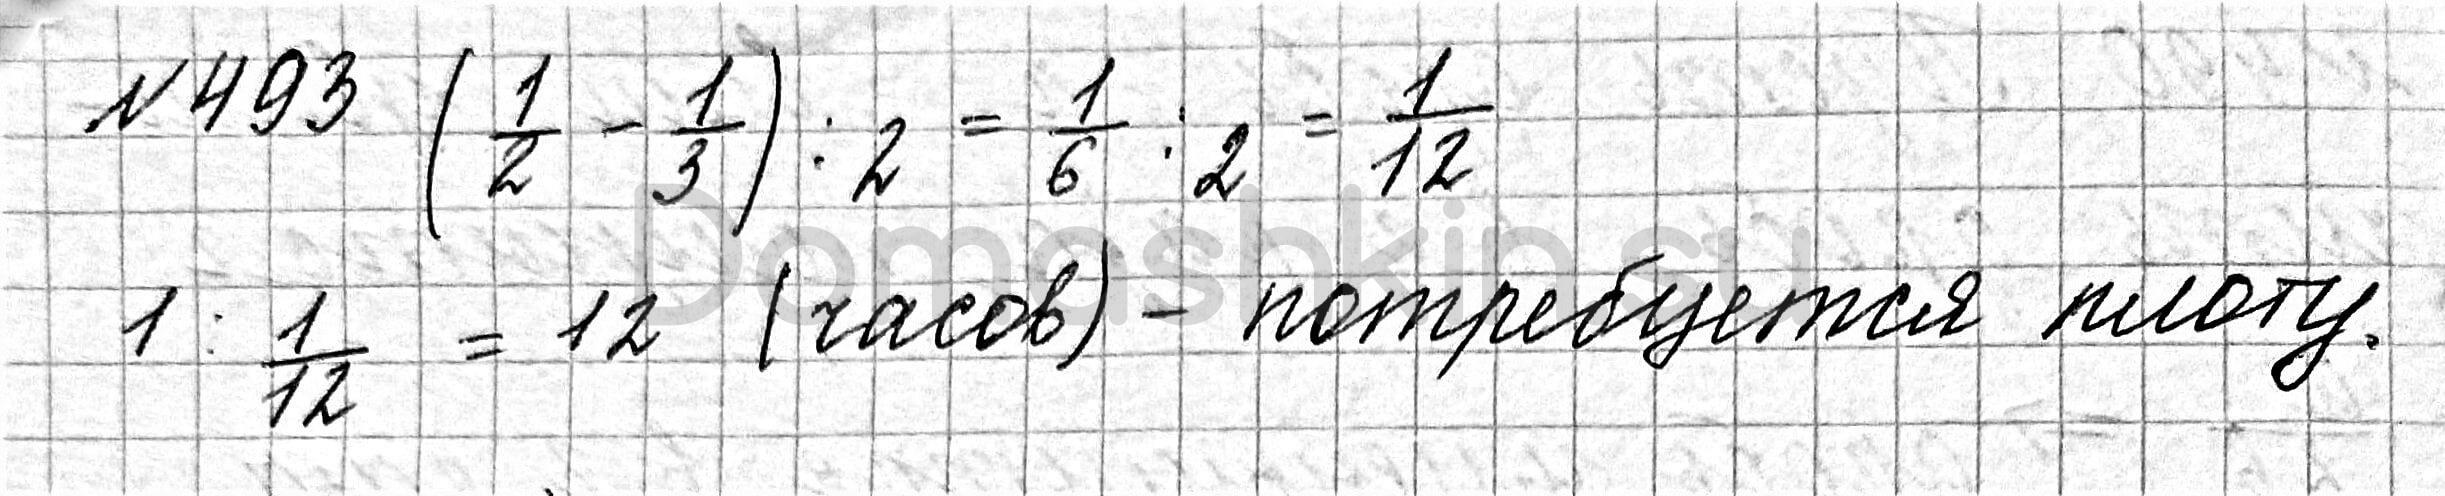 Математика 6 класс учебник Мерзляк номер 493 решение